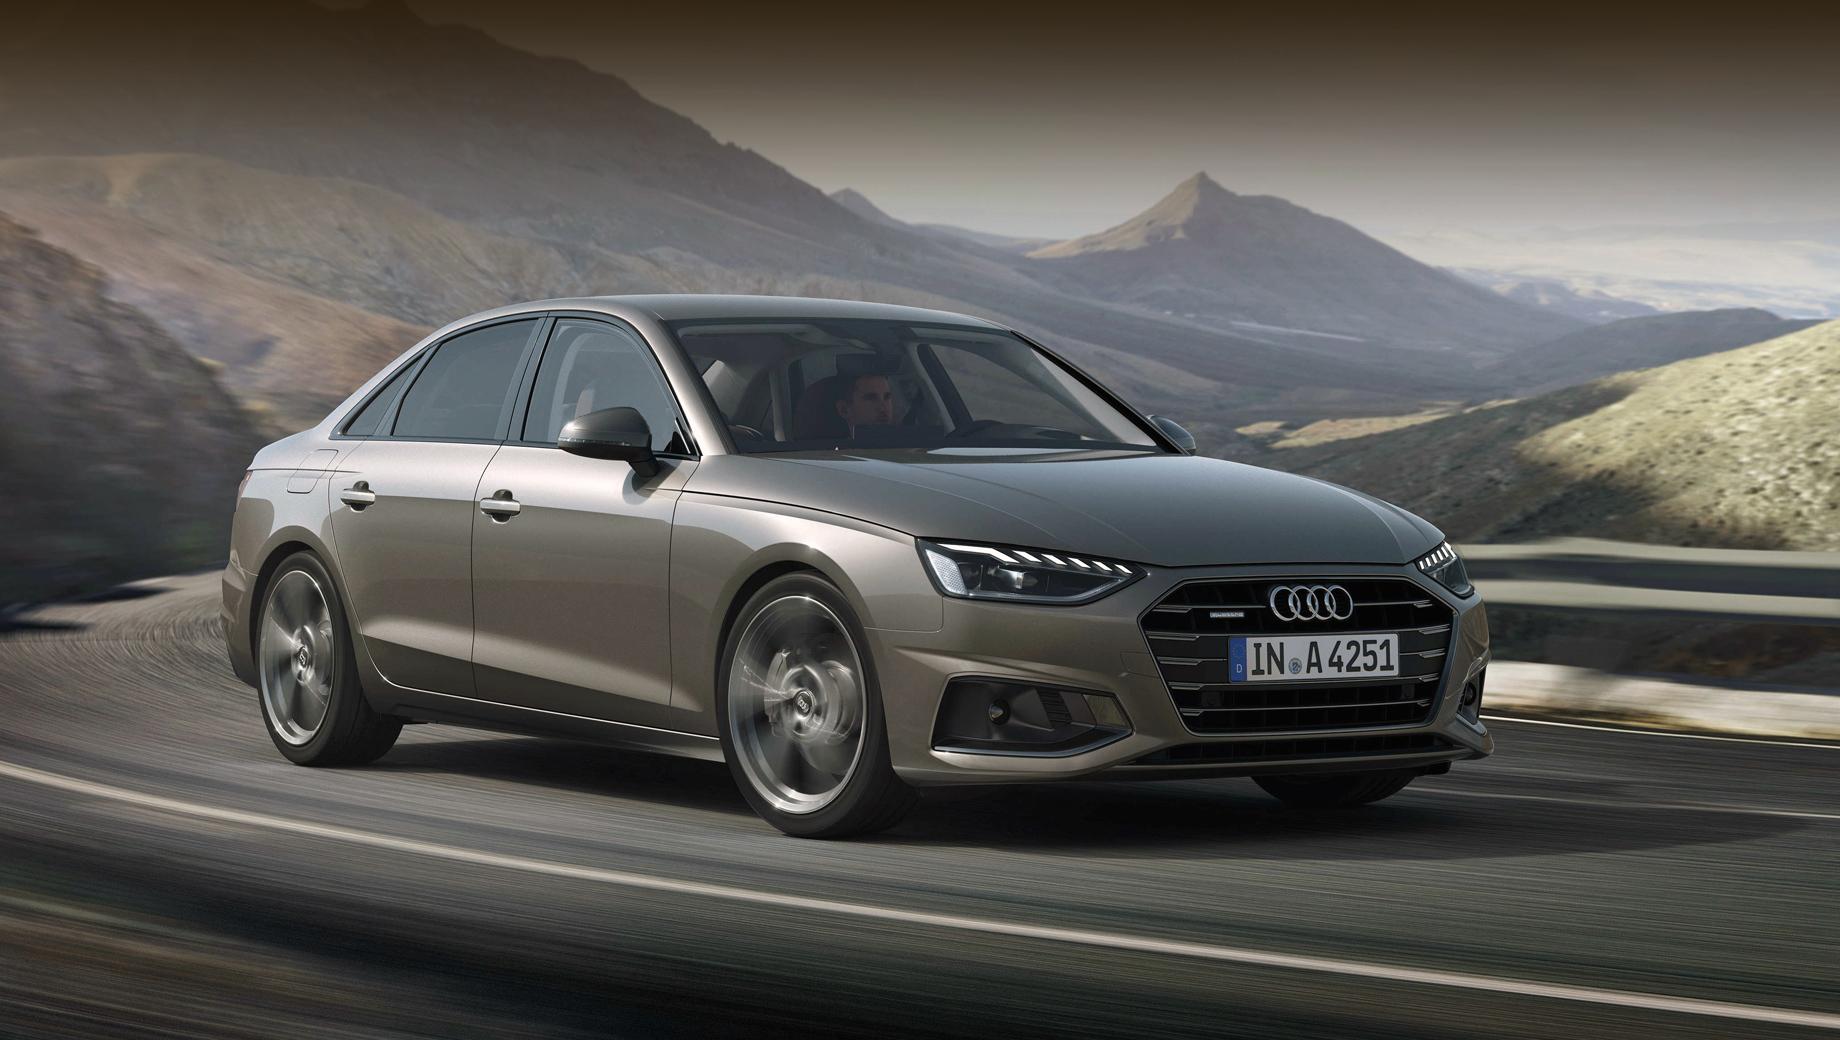 Семейства Audi A4 и A5 синхронно обновились в России